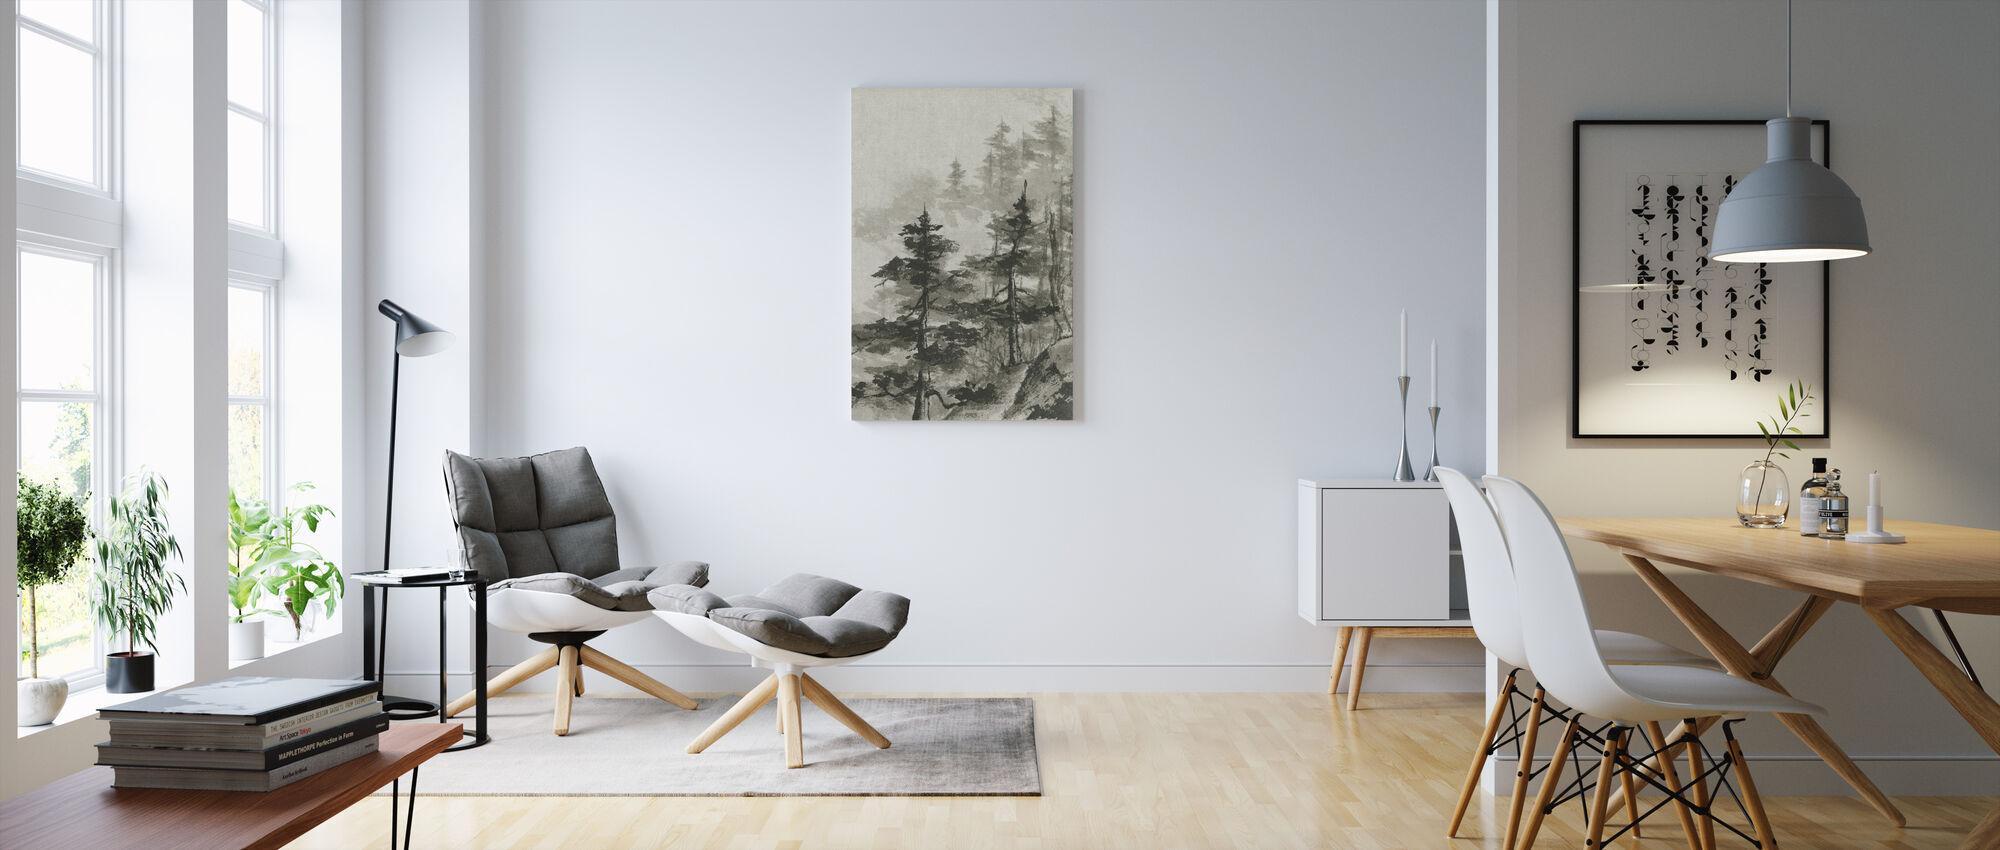 Sumi trädtopparna - Canvastavla - Vardagsrum